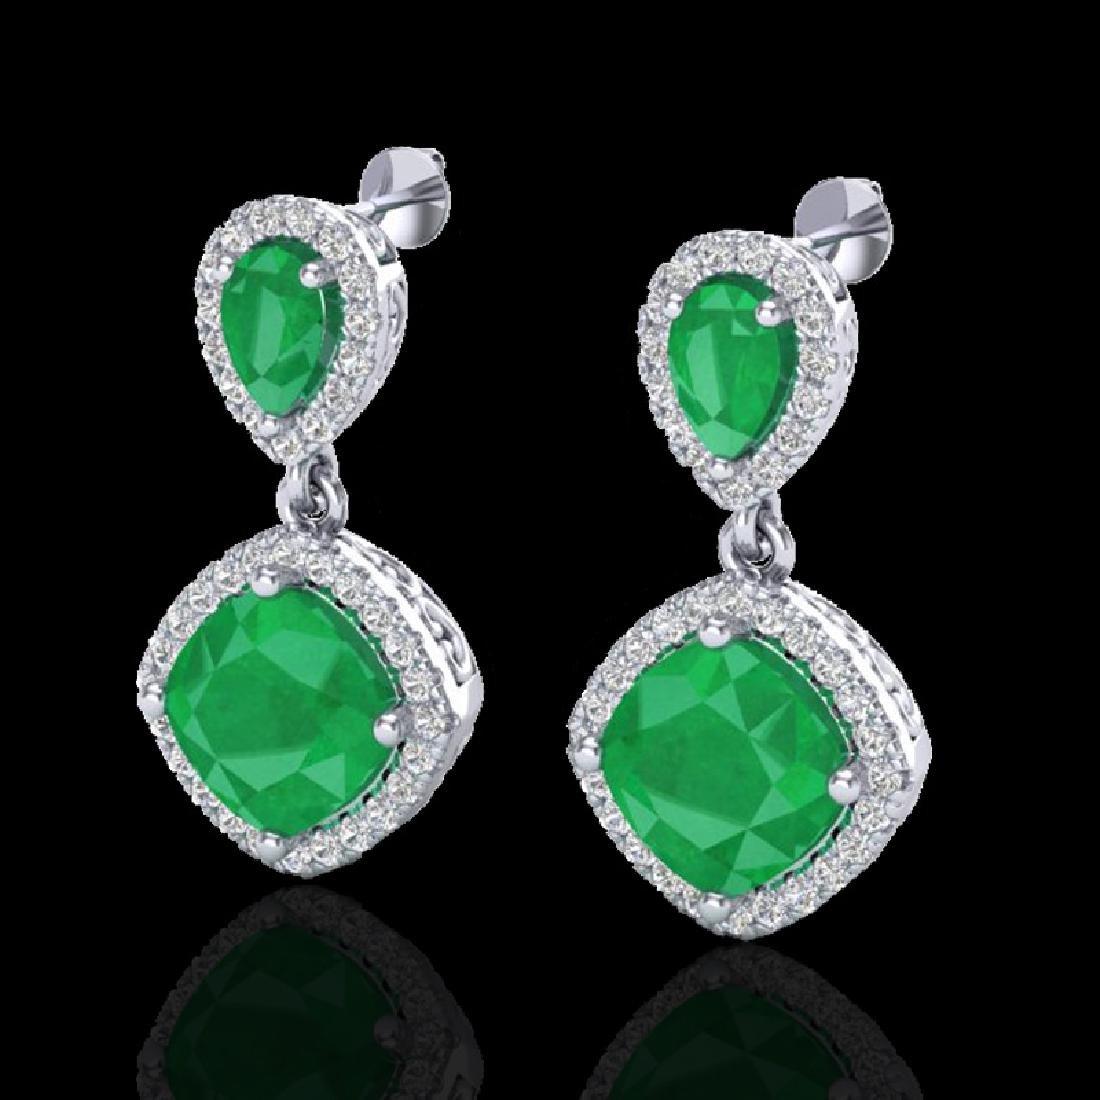 7 CTW Emerald & Micro Pave VS/SI Diamond Earrings